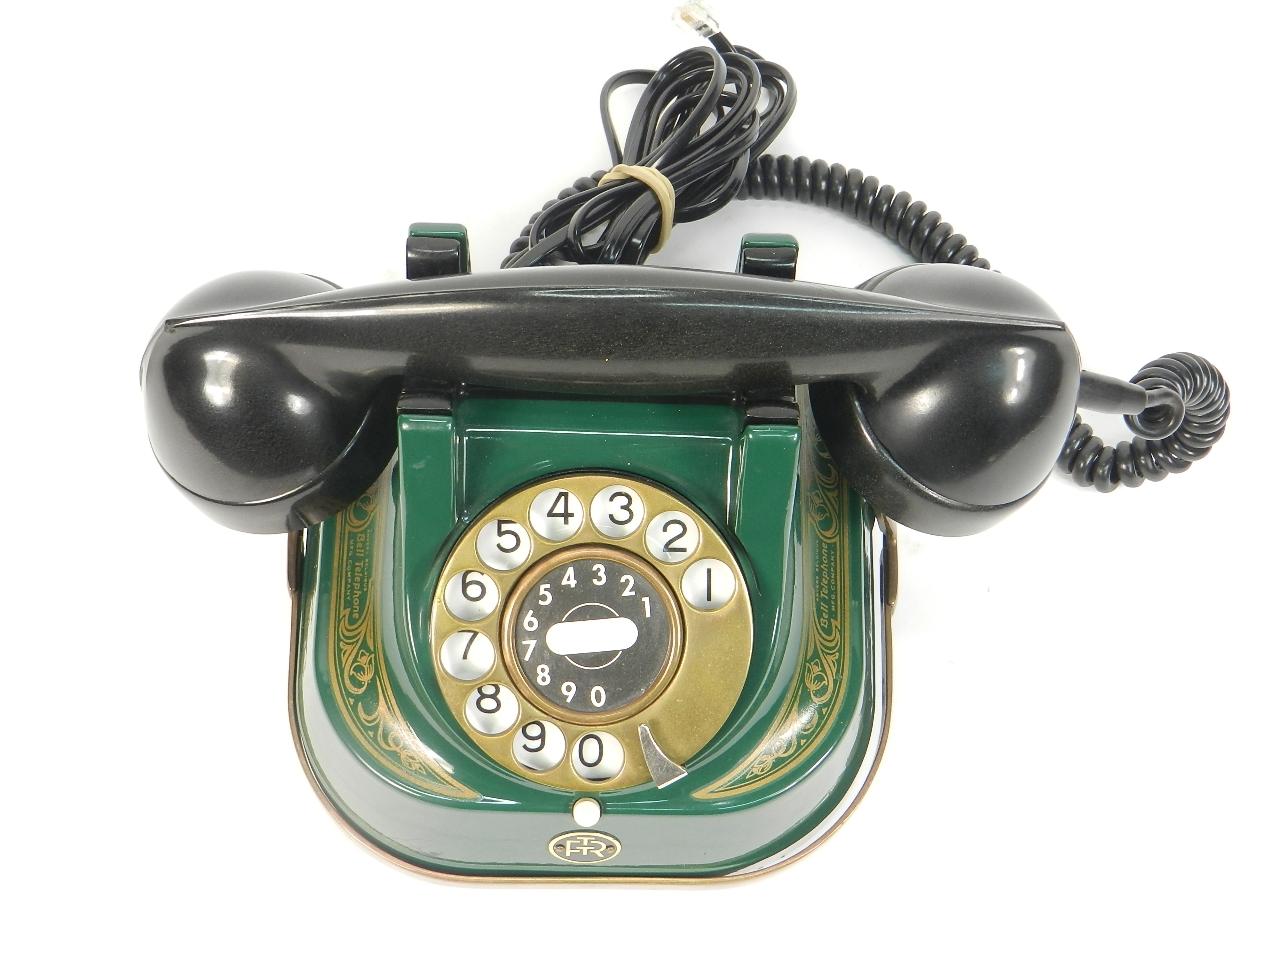 Imagen BELL TELEPHONE Cº  AÑO 1940, BELGICA 41399